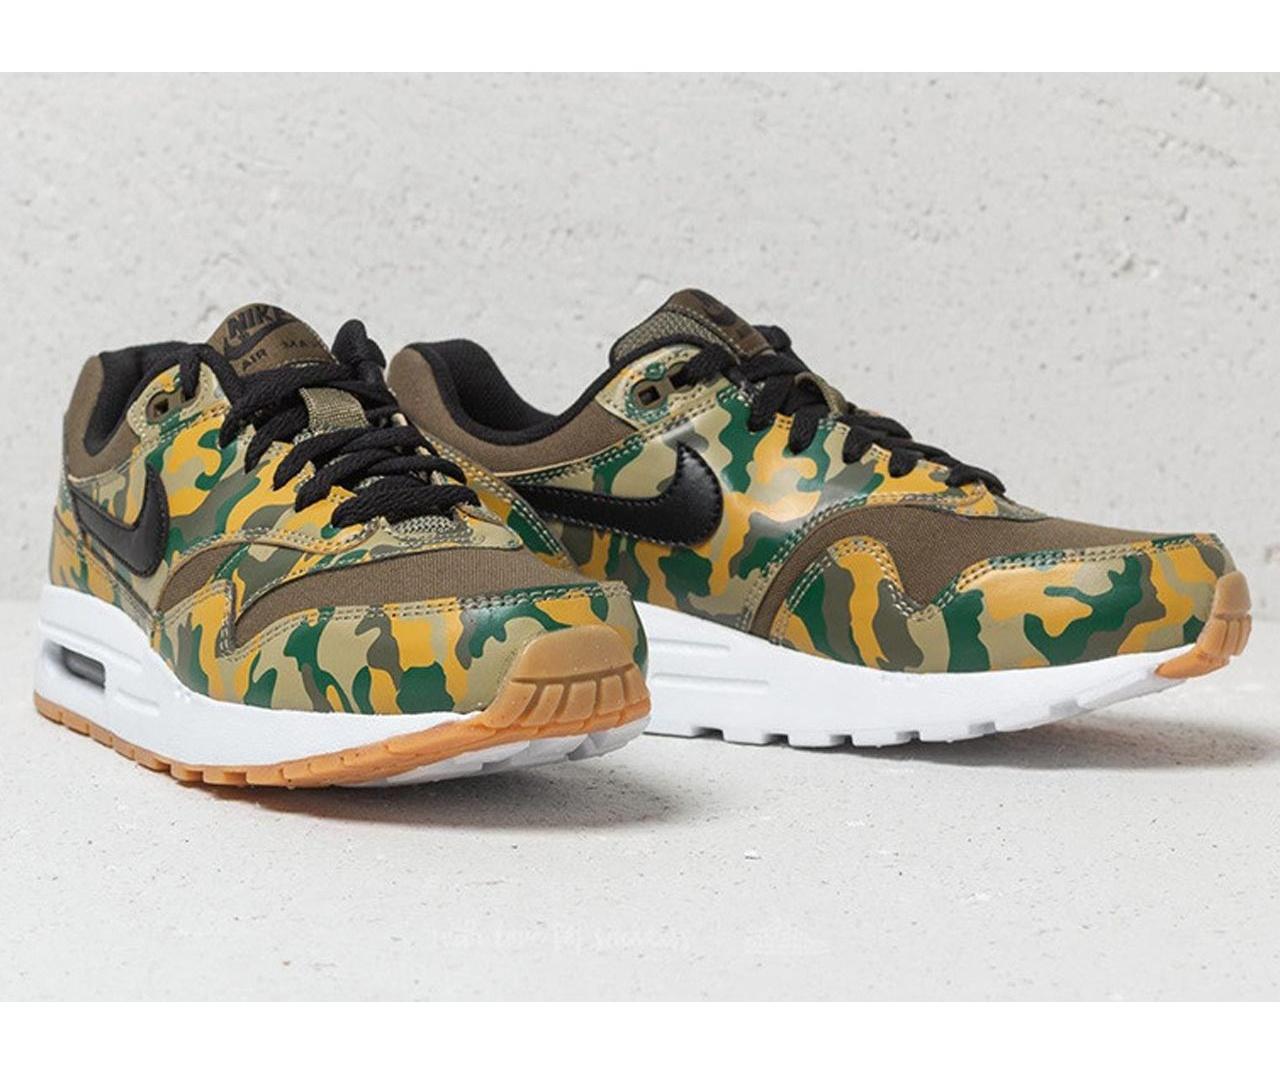 کفش مخصوص دویدن زنانه نایکی مدل Air max کد 8765-098